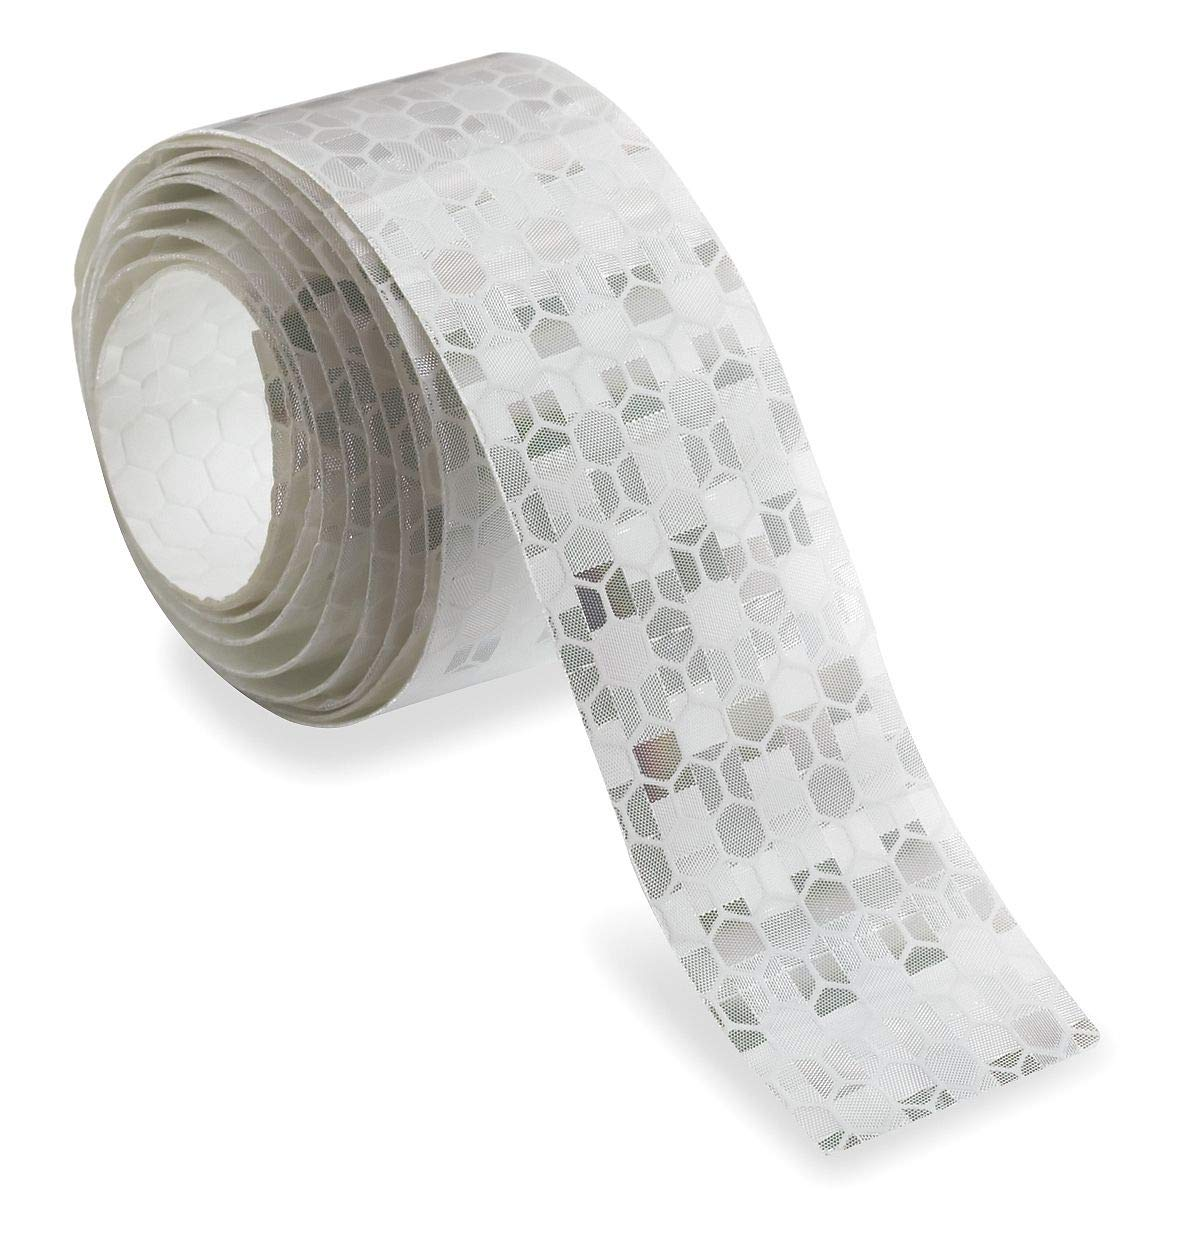 Telemecanique Sensors Silver Reflective Tape, Paper, For Use With Polarized Retroreflective Photoelectric Sensors - XUZB15